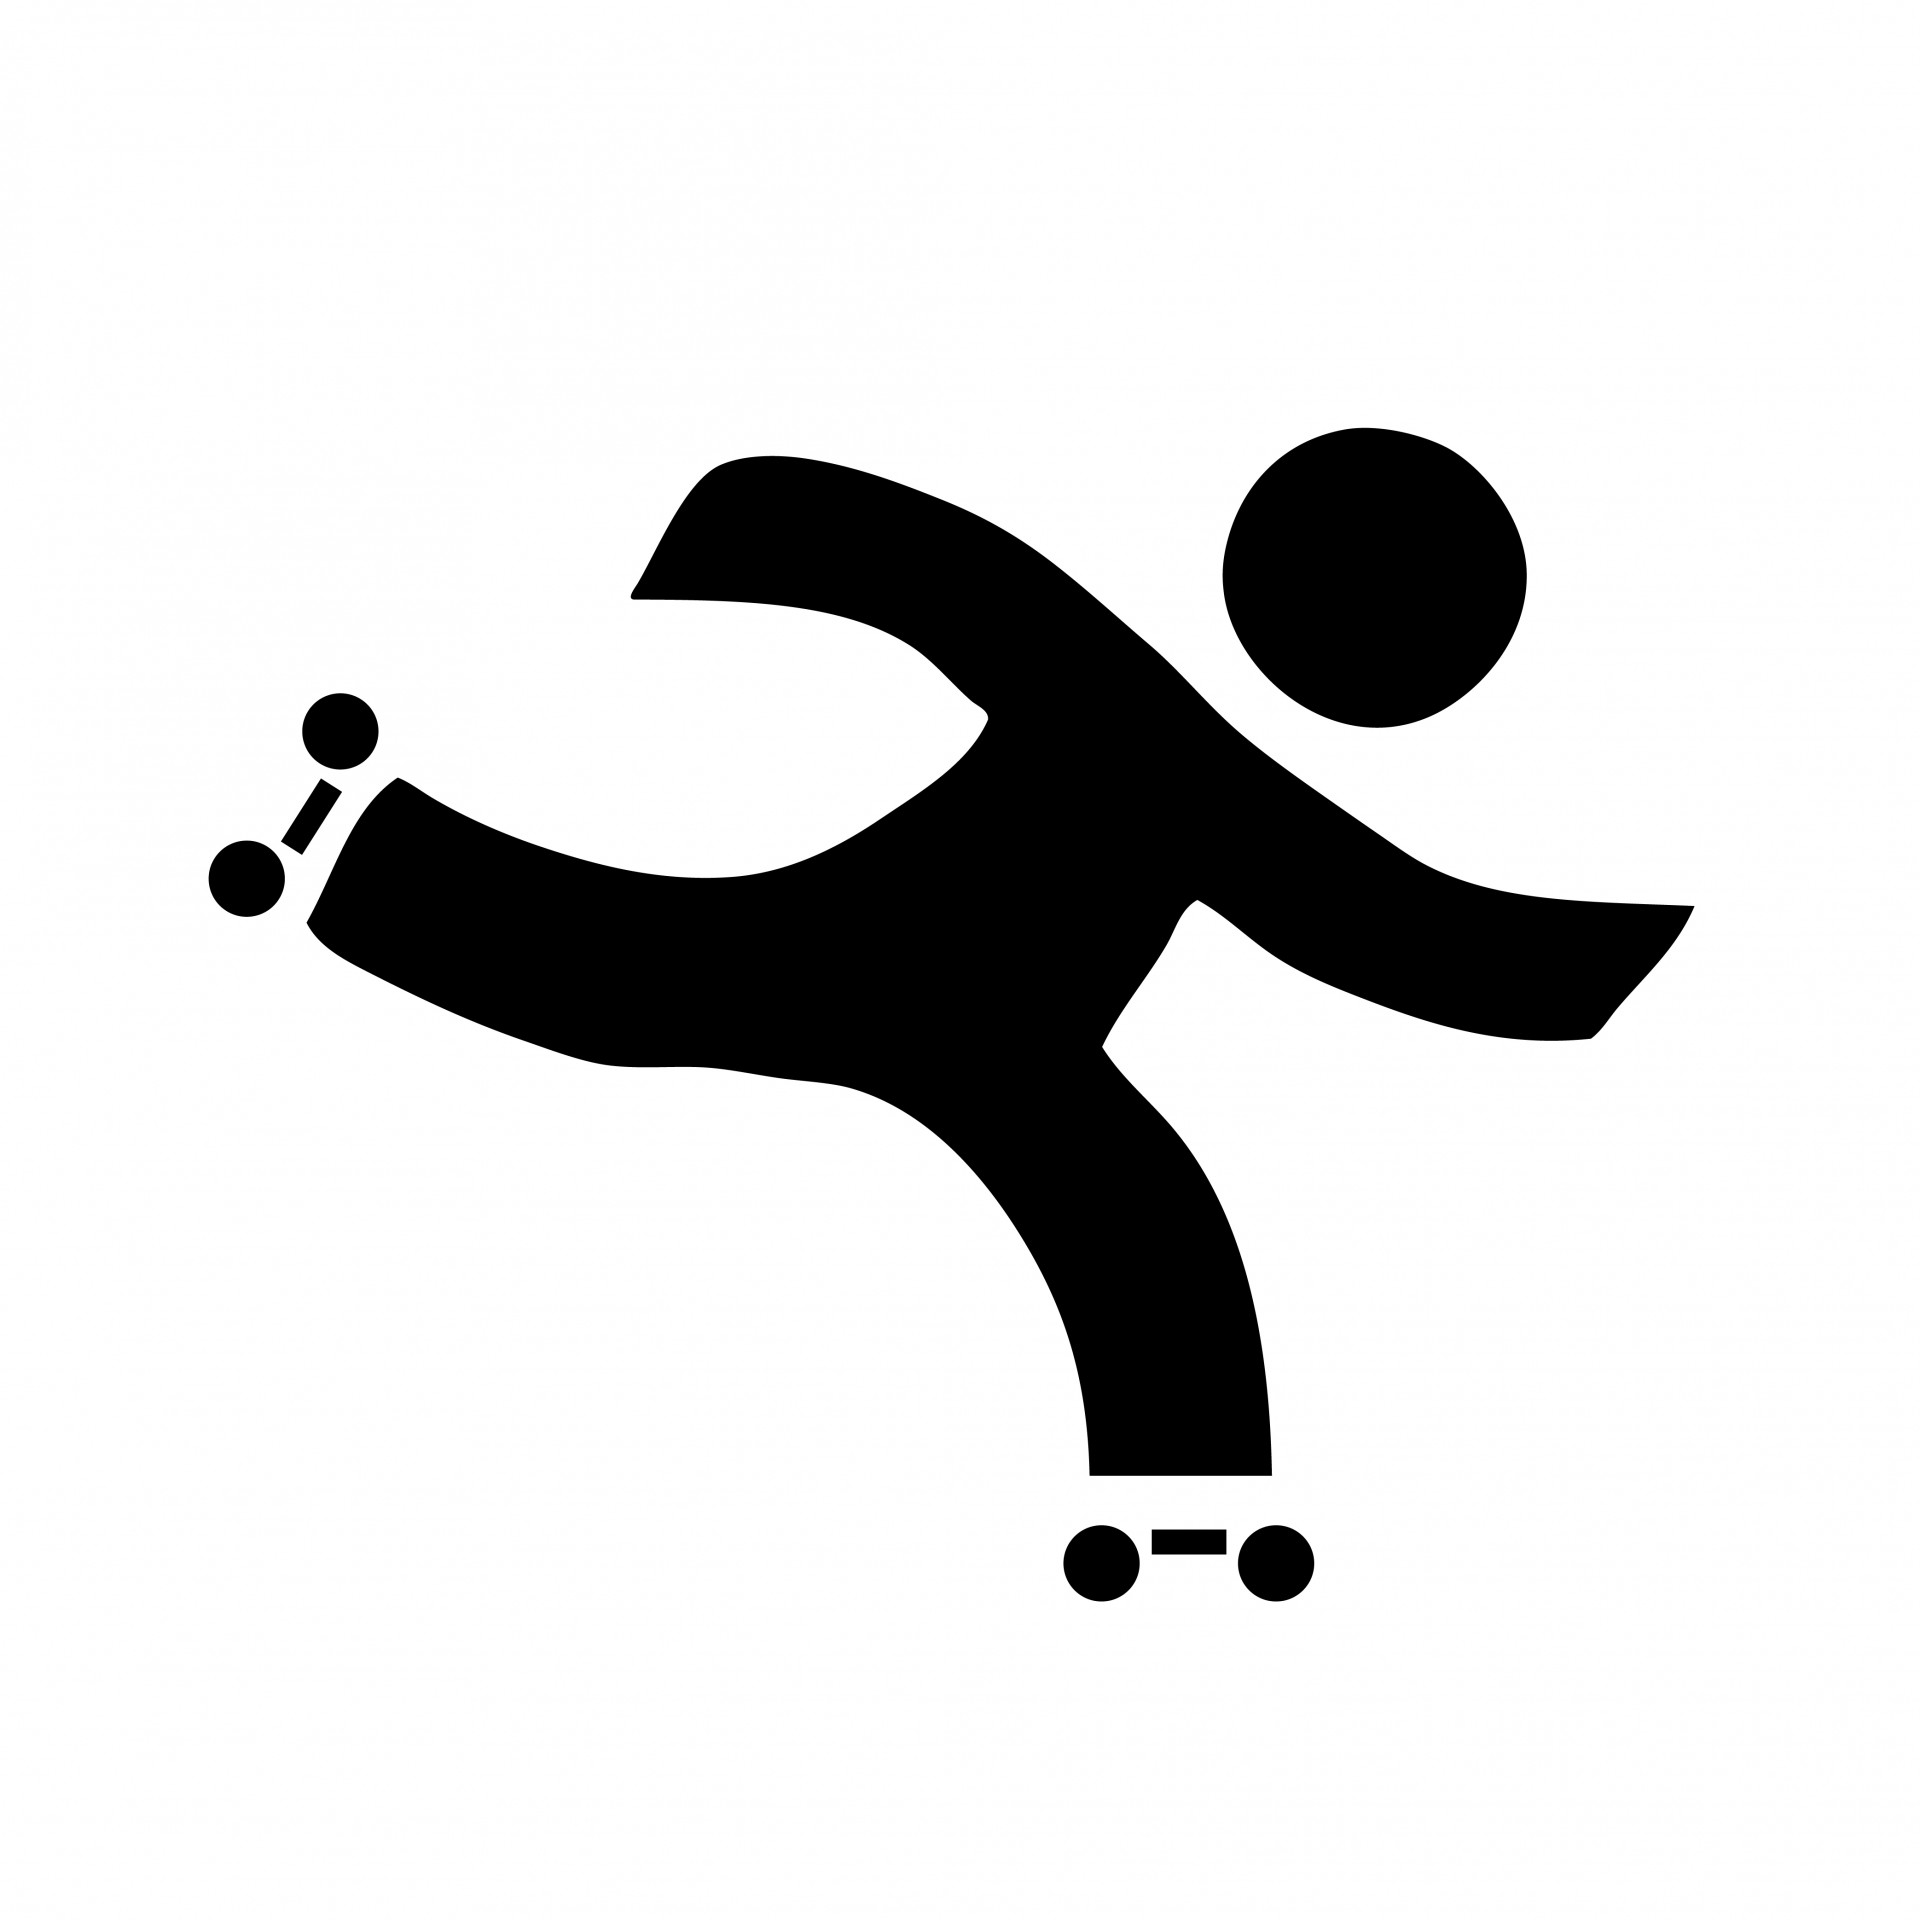 Roller Skating Clipart - Roller Skating Clipart